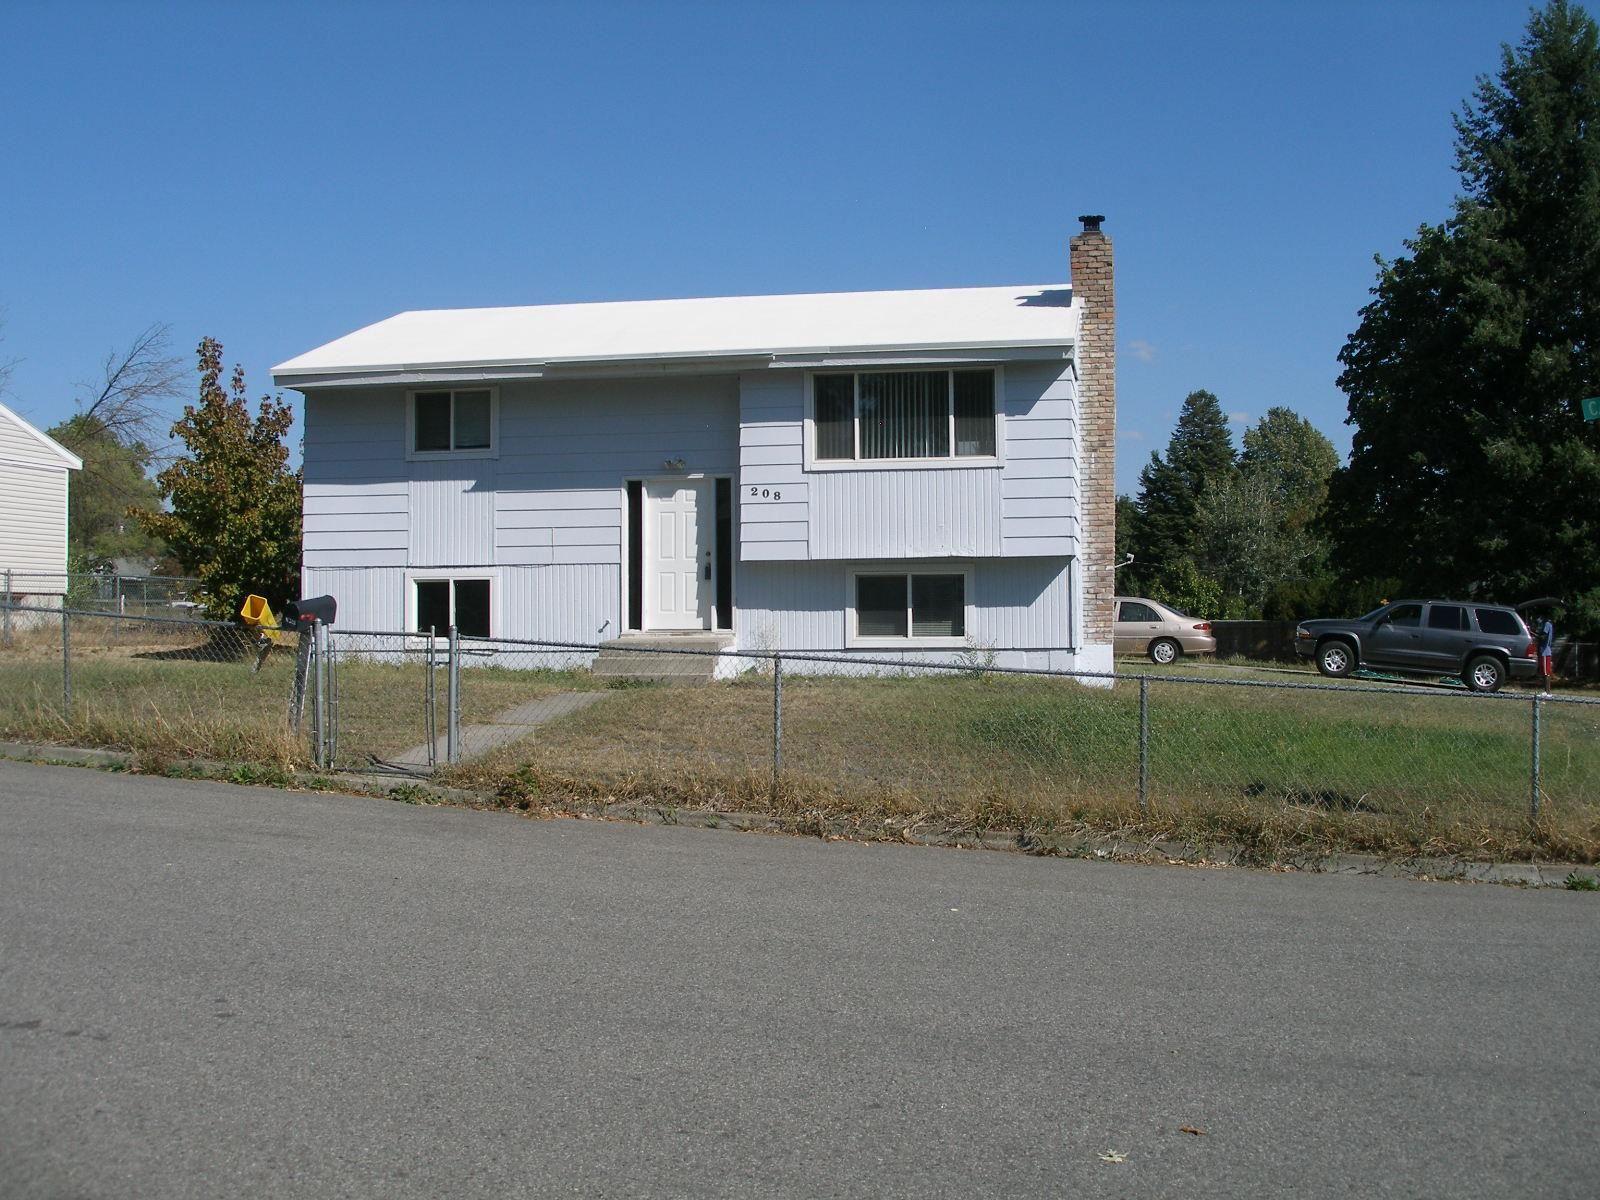 208 N Calvin Rd, Spokane, WA 99216 - #: 202122494